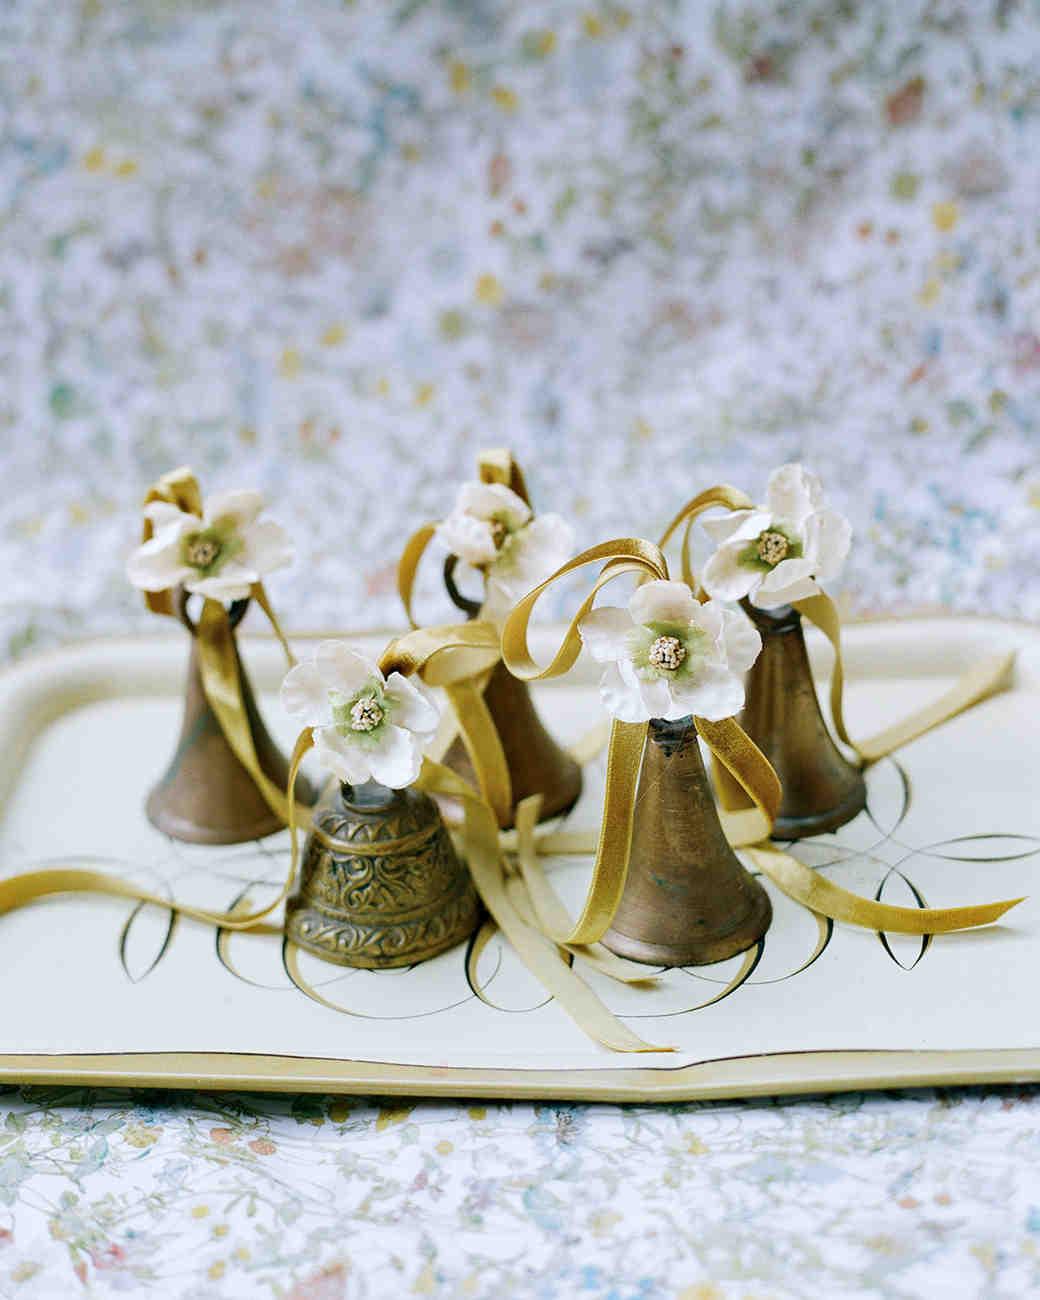 adrienne-jason-wedding-minnesota-bells-0087-s111925.jpg